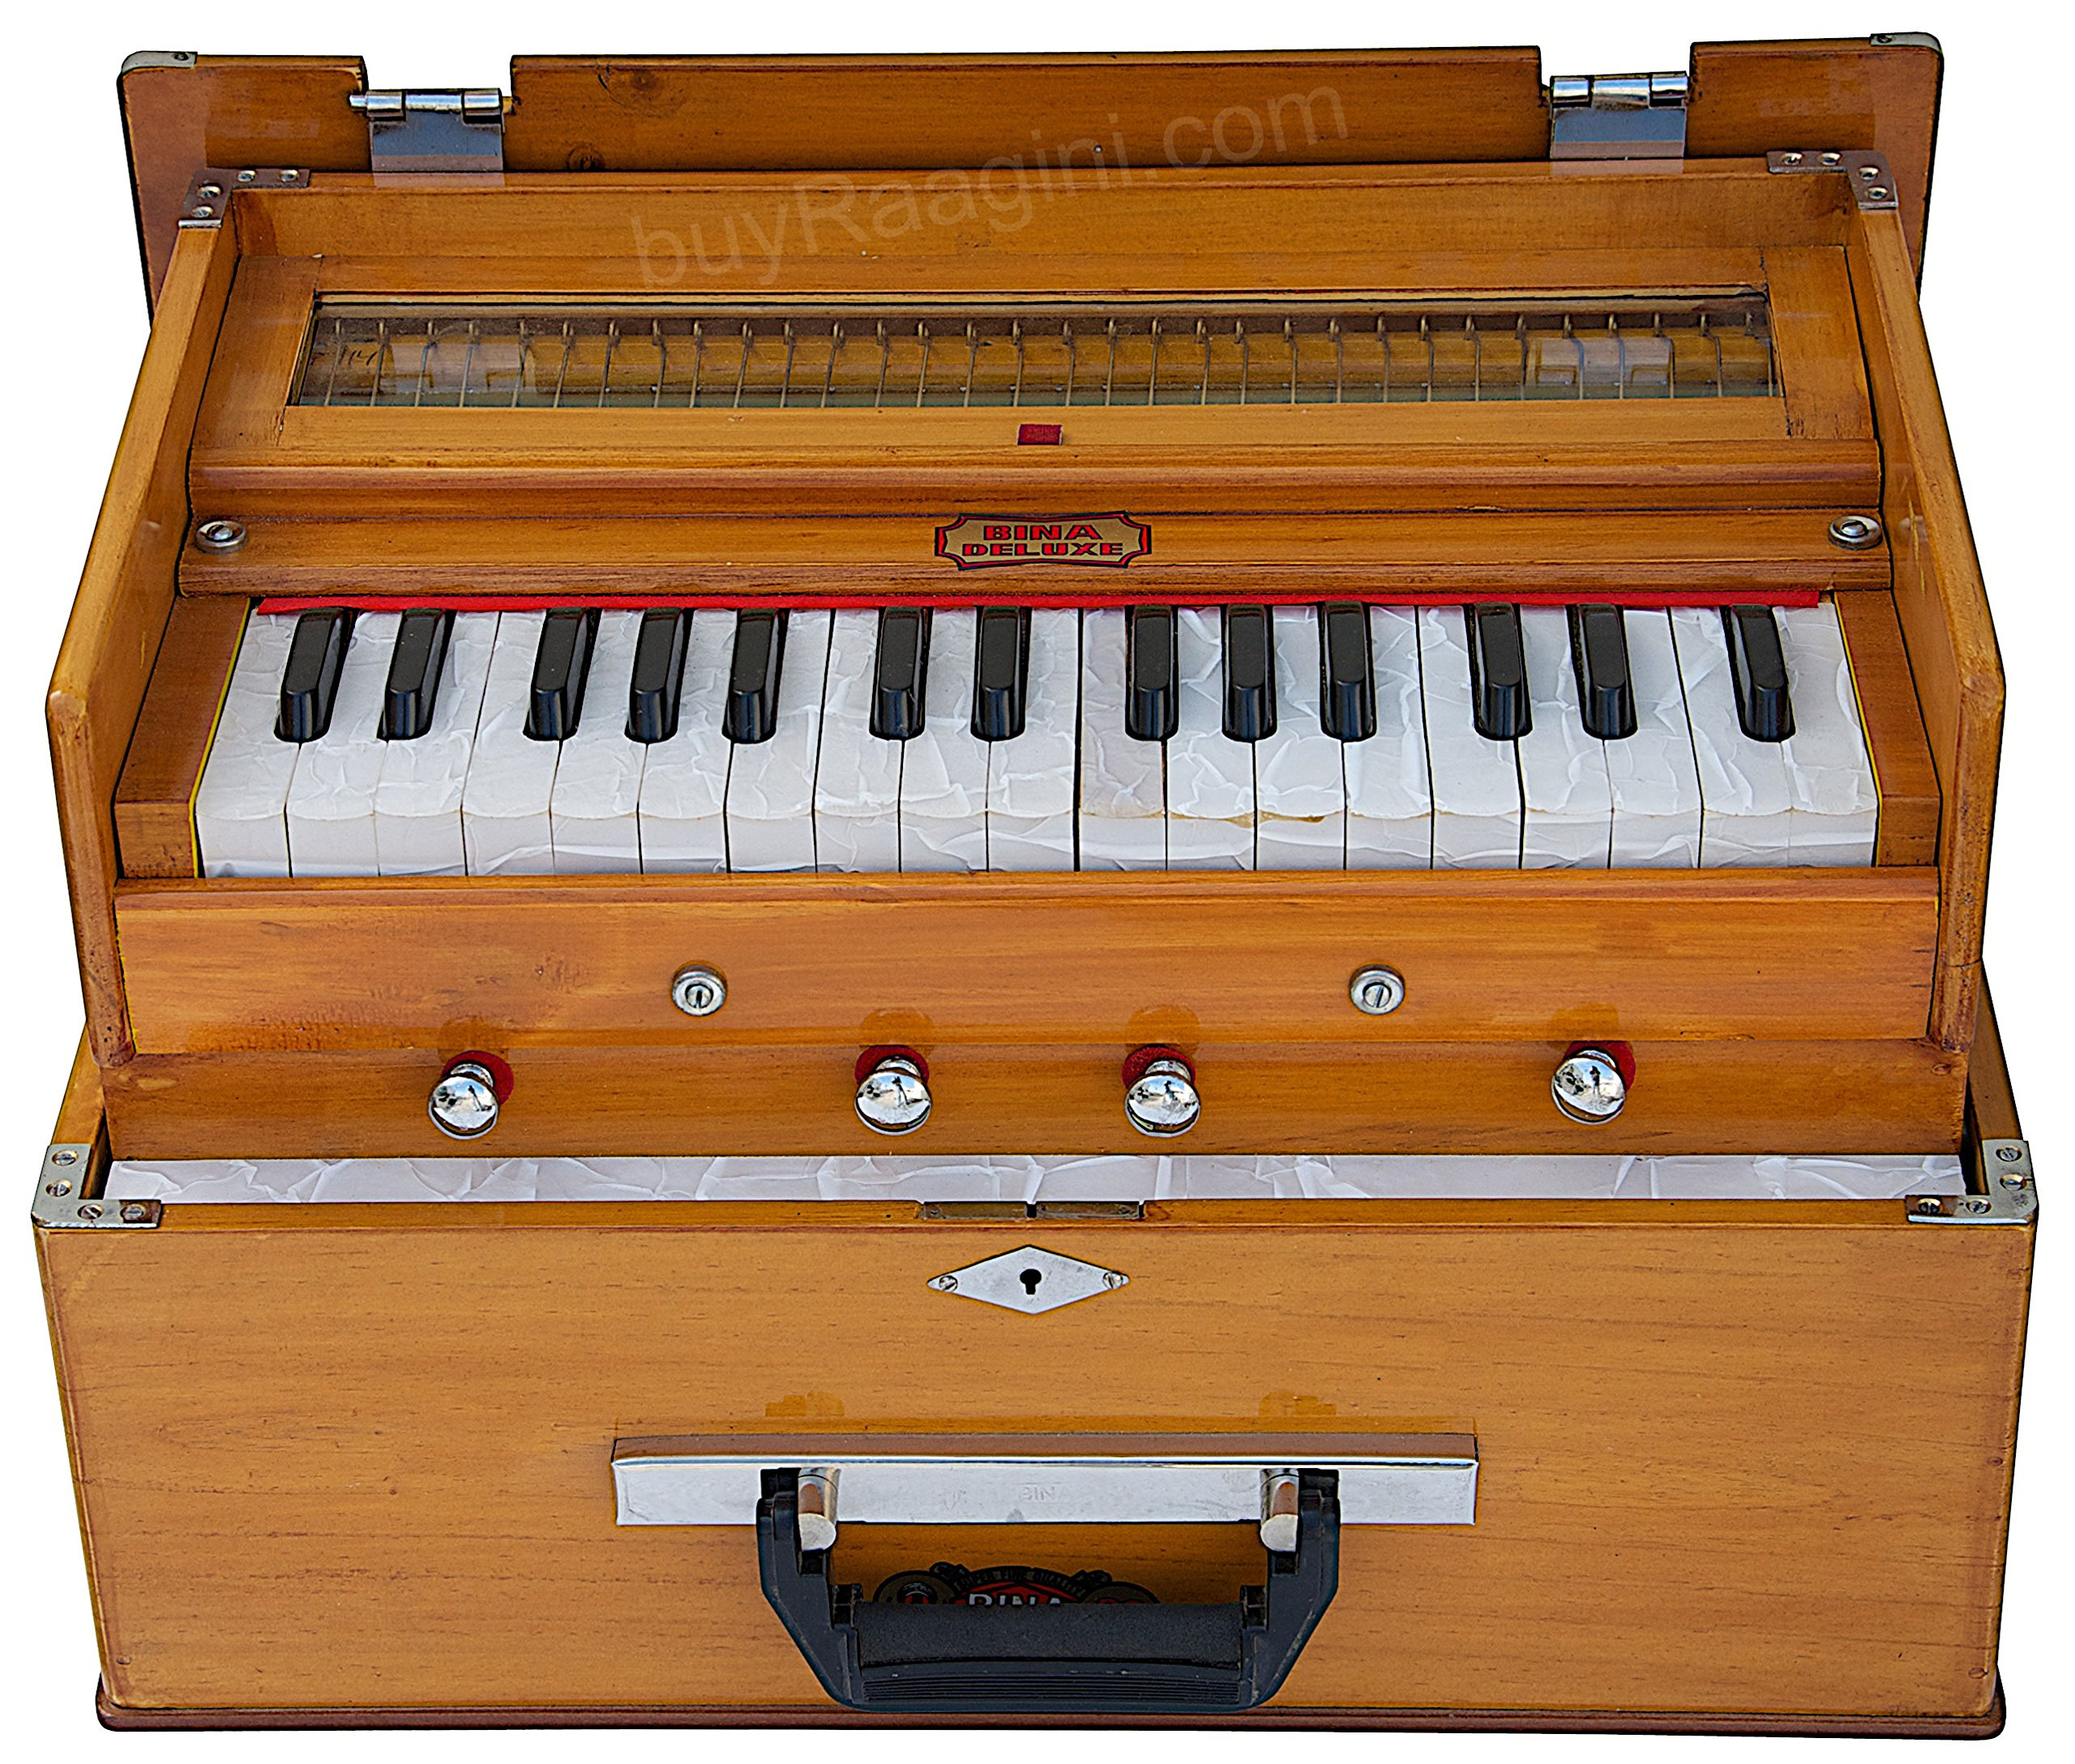 BINA 23B Deluxe, Harmonium, 2 1/2 Octaves, 32 Keys, Small, Portable, Compact, Special Reeds, Safri, Natural Color, Bag, Book, Kirtan, Musical Instrument Indian (PDI-411) by Bina